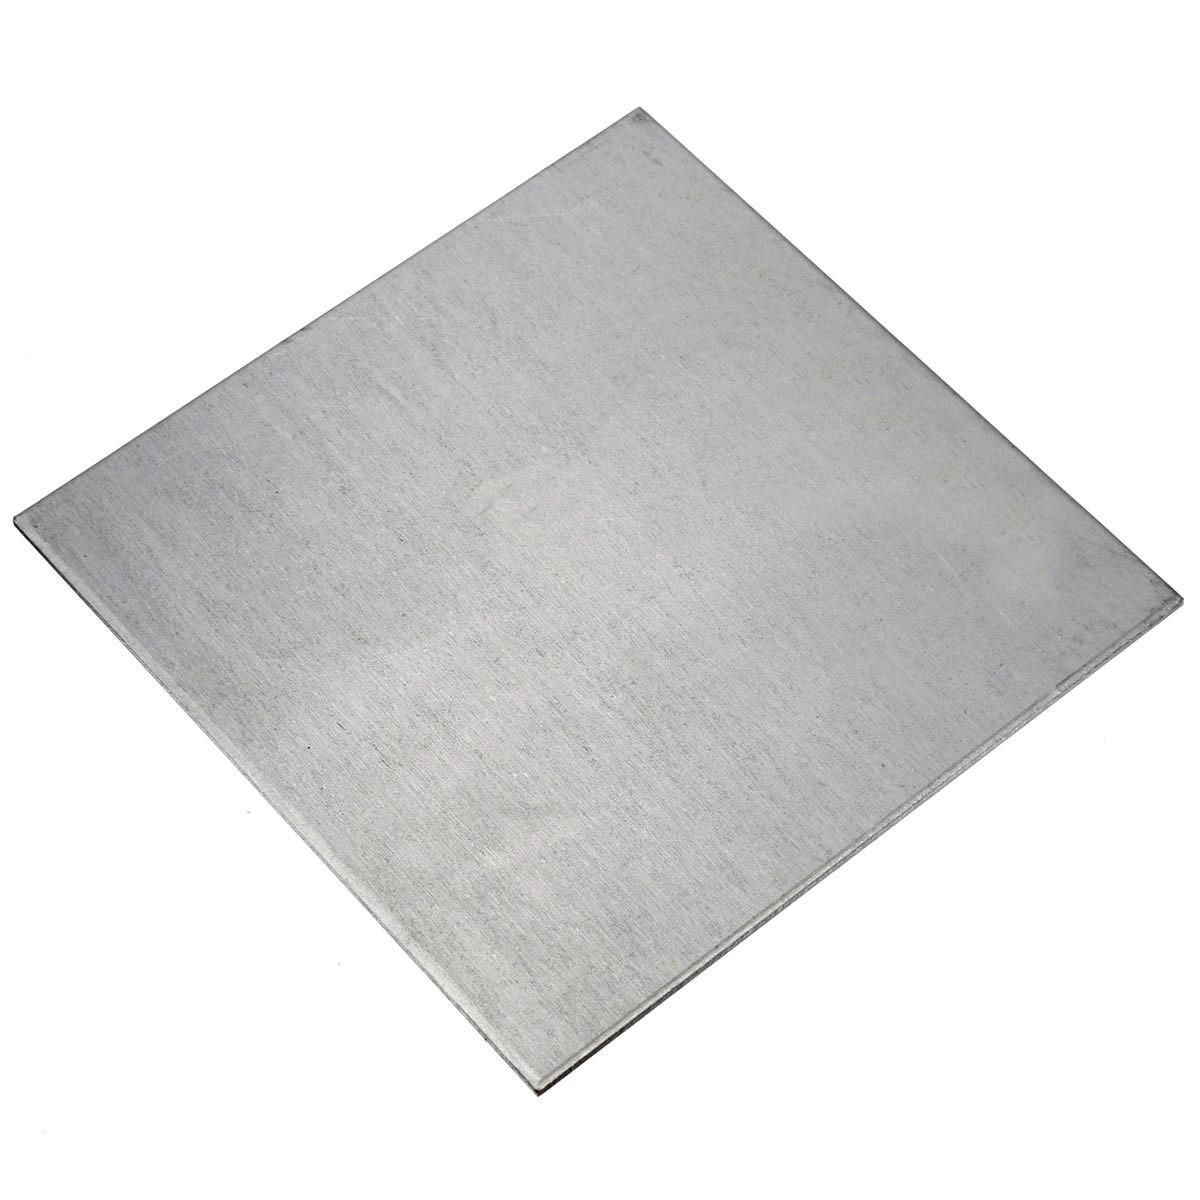 New 1Pcs 100x100x2mm Silver Titanium Plate Titanium Ti Plate Sheet Gr2 Grade 2 ASTM B265 High Quality For Power Tool